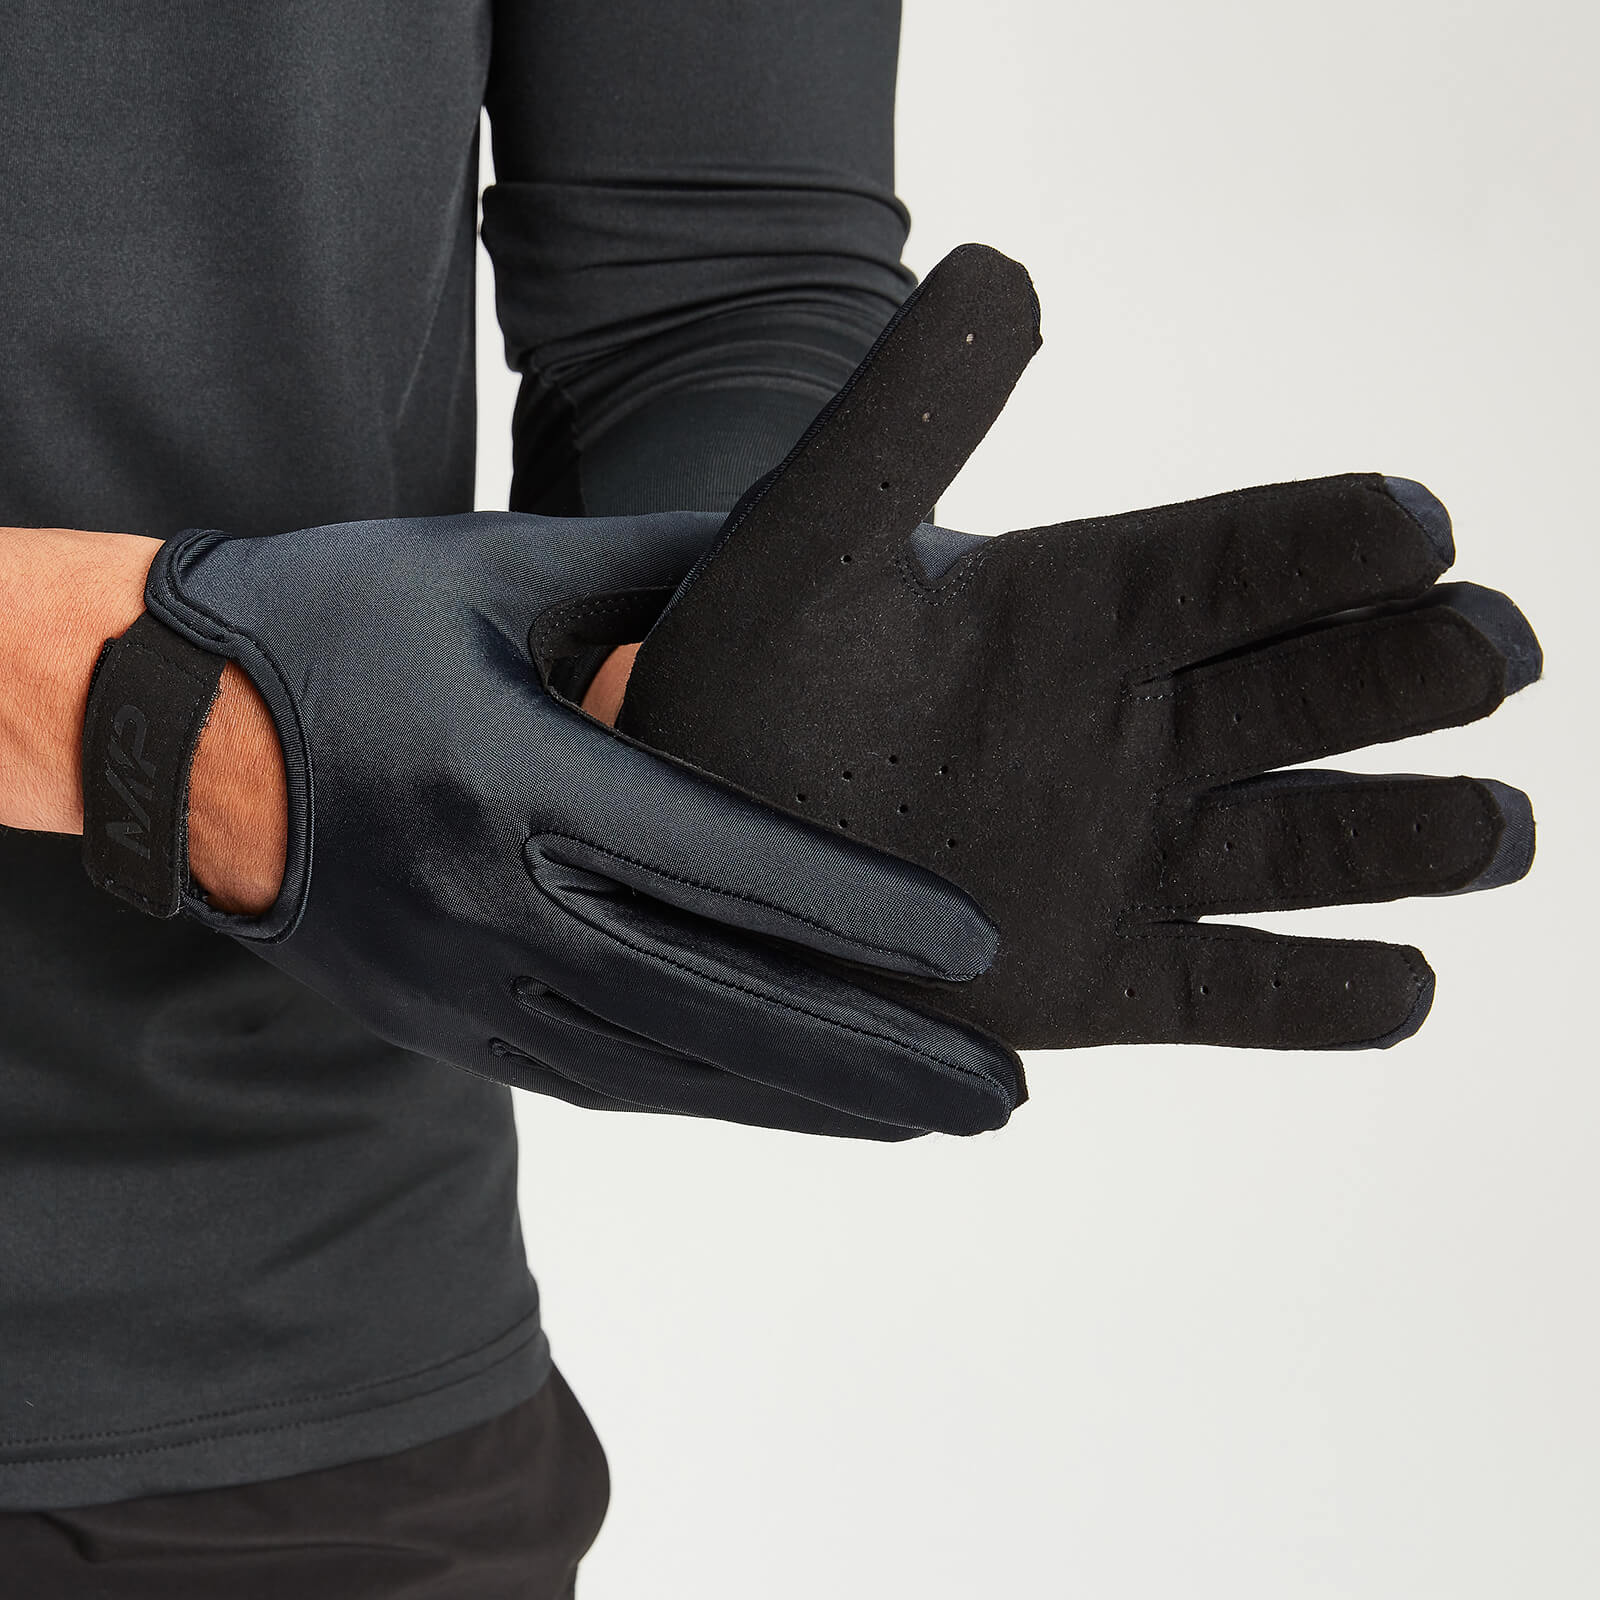 Mp Men's Full Coverage Lifting Gloves - Black - Xl Mpa242black Other Sports, Black